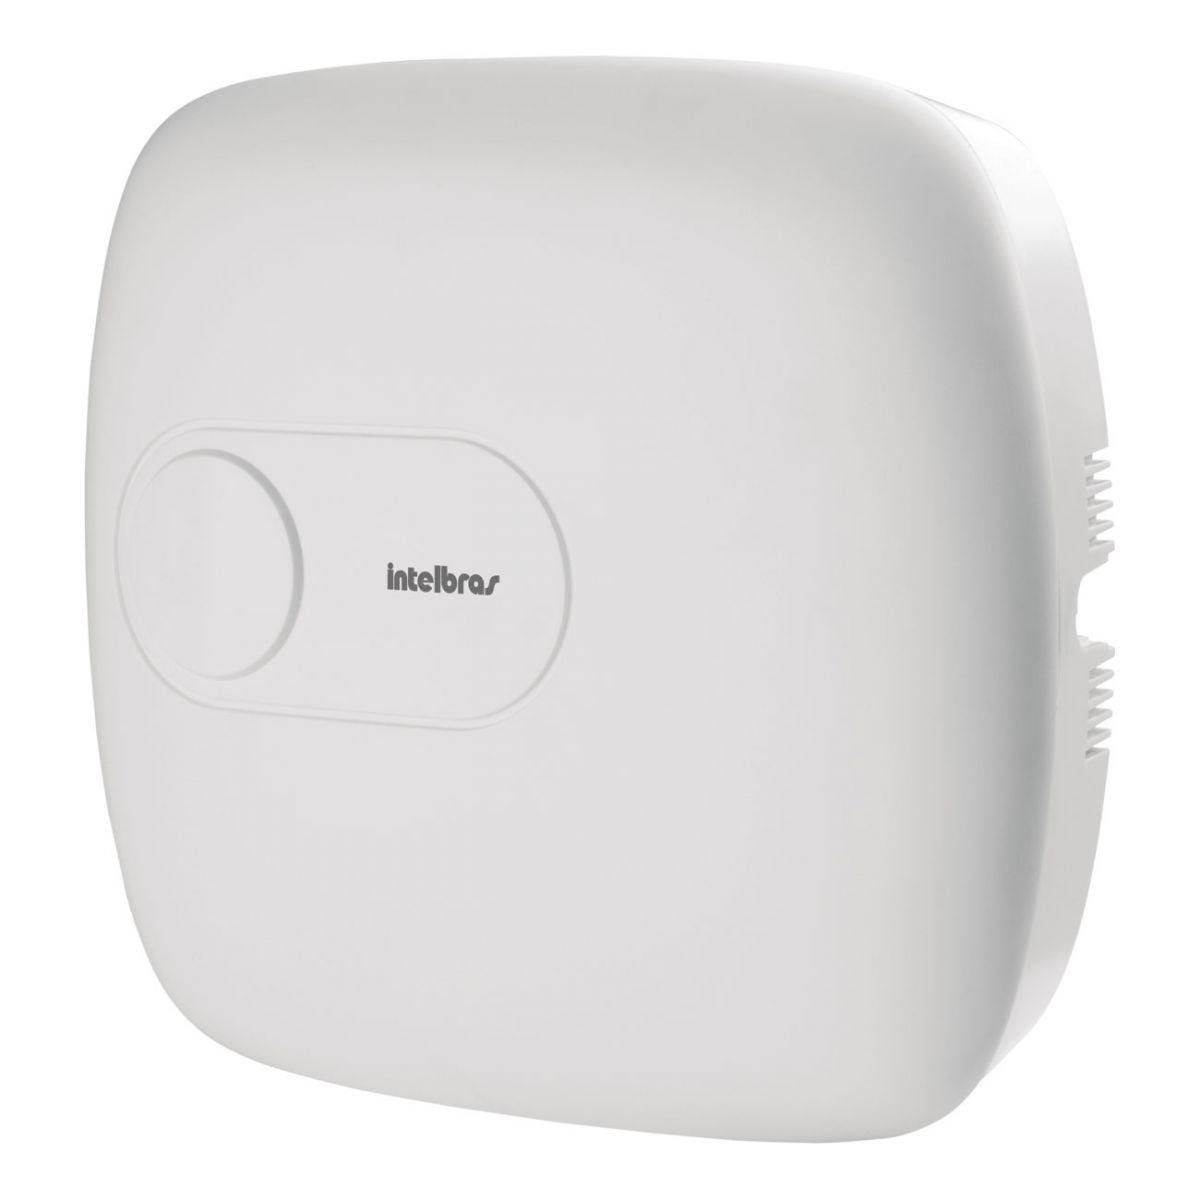 Central de alarme monitorada Intelbras 4010 SMART expansível até 64 zonas e até 4 teclados  - Tudo Forte